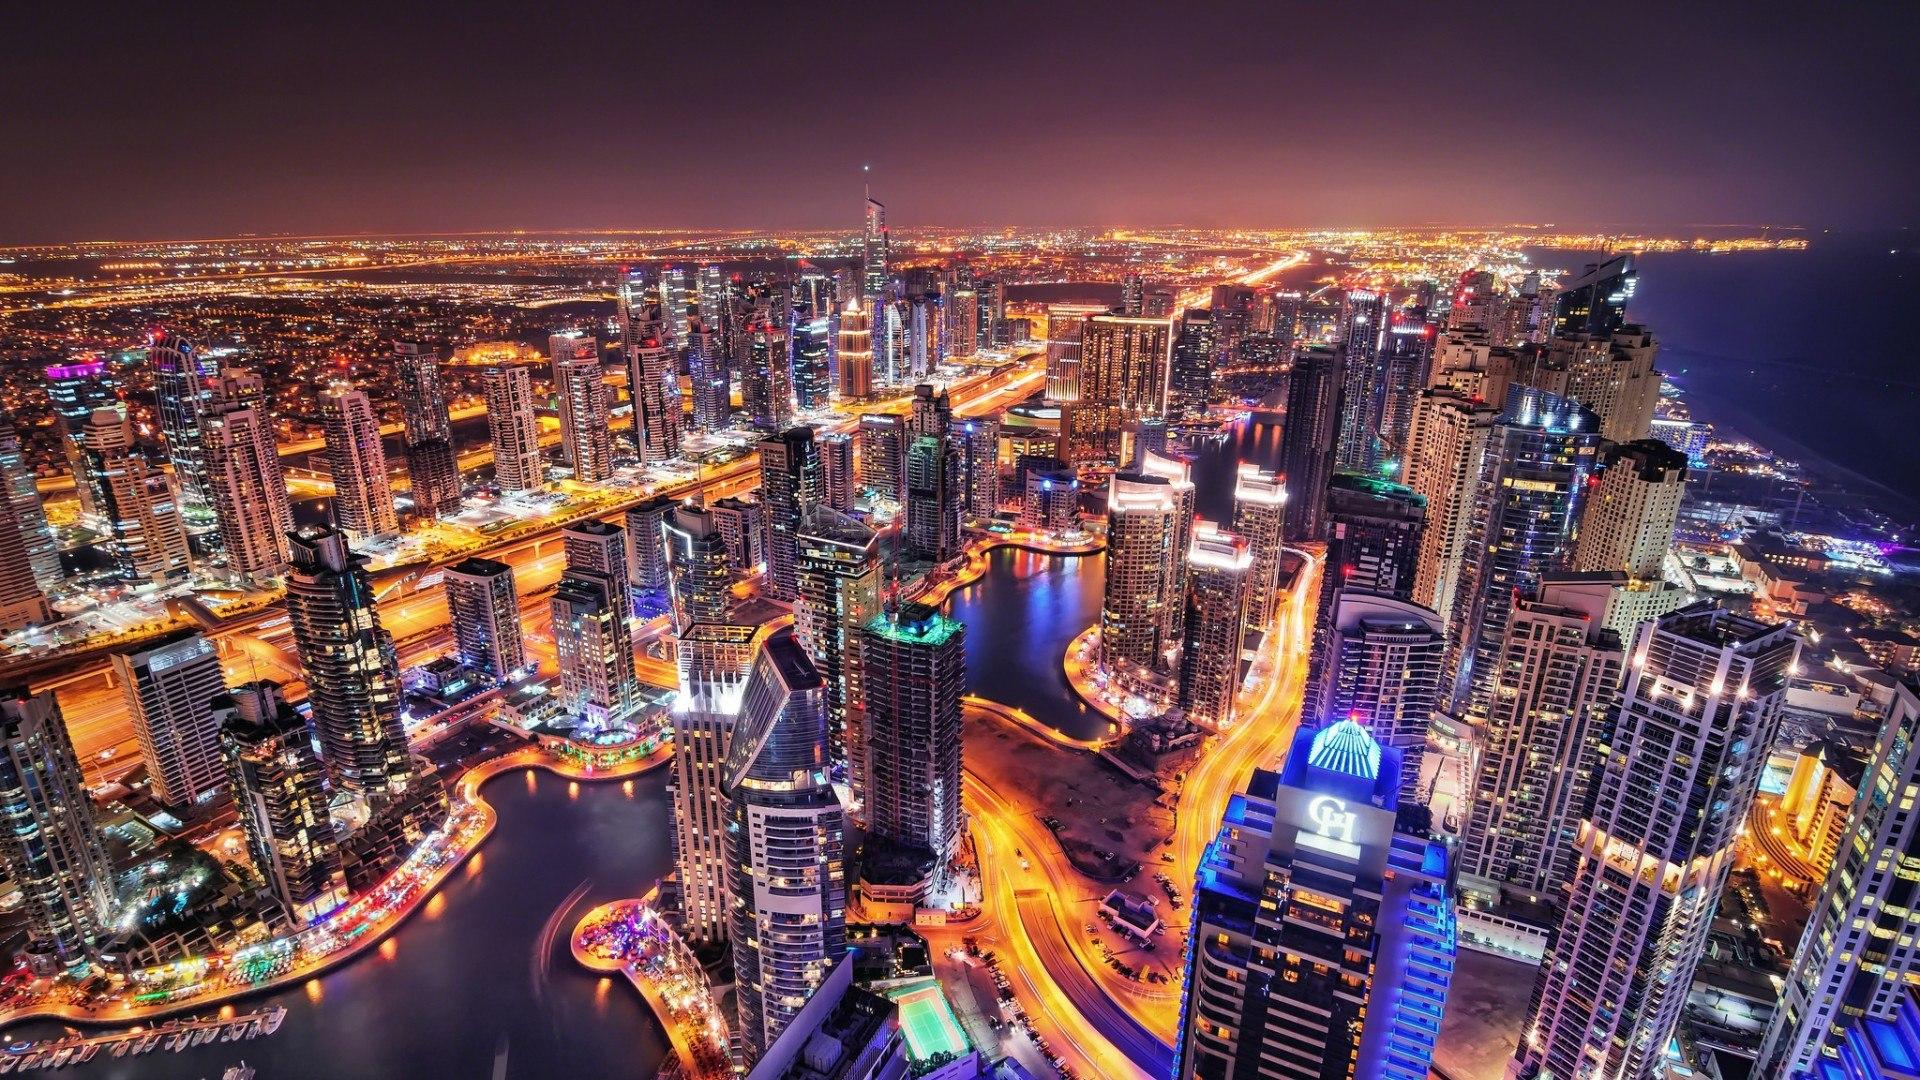 Must see Wallpaper Night Dubai - Cities_Night_lights_of_Dubai_094294_  Picture-814728.jpg